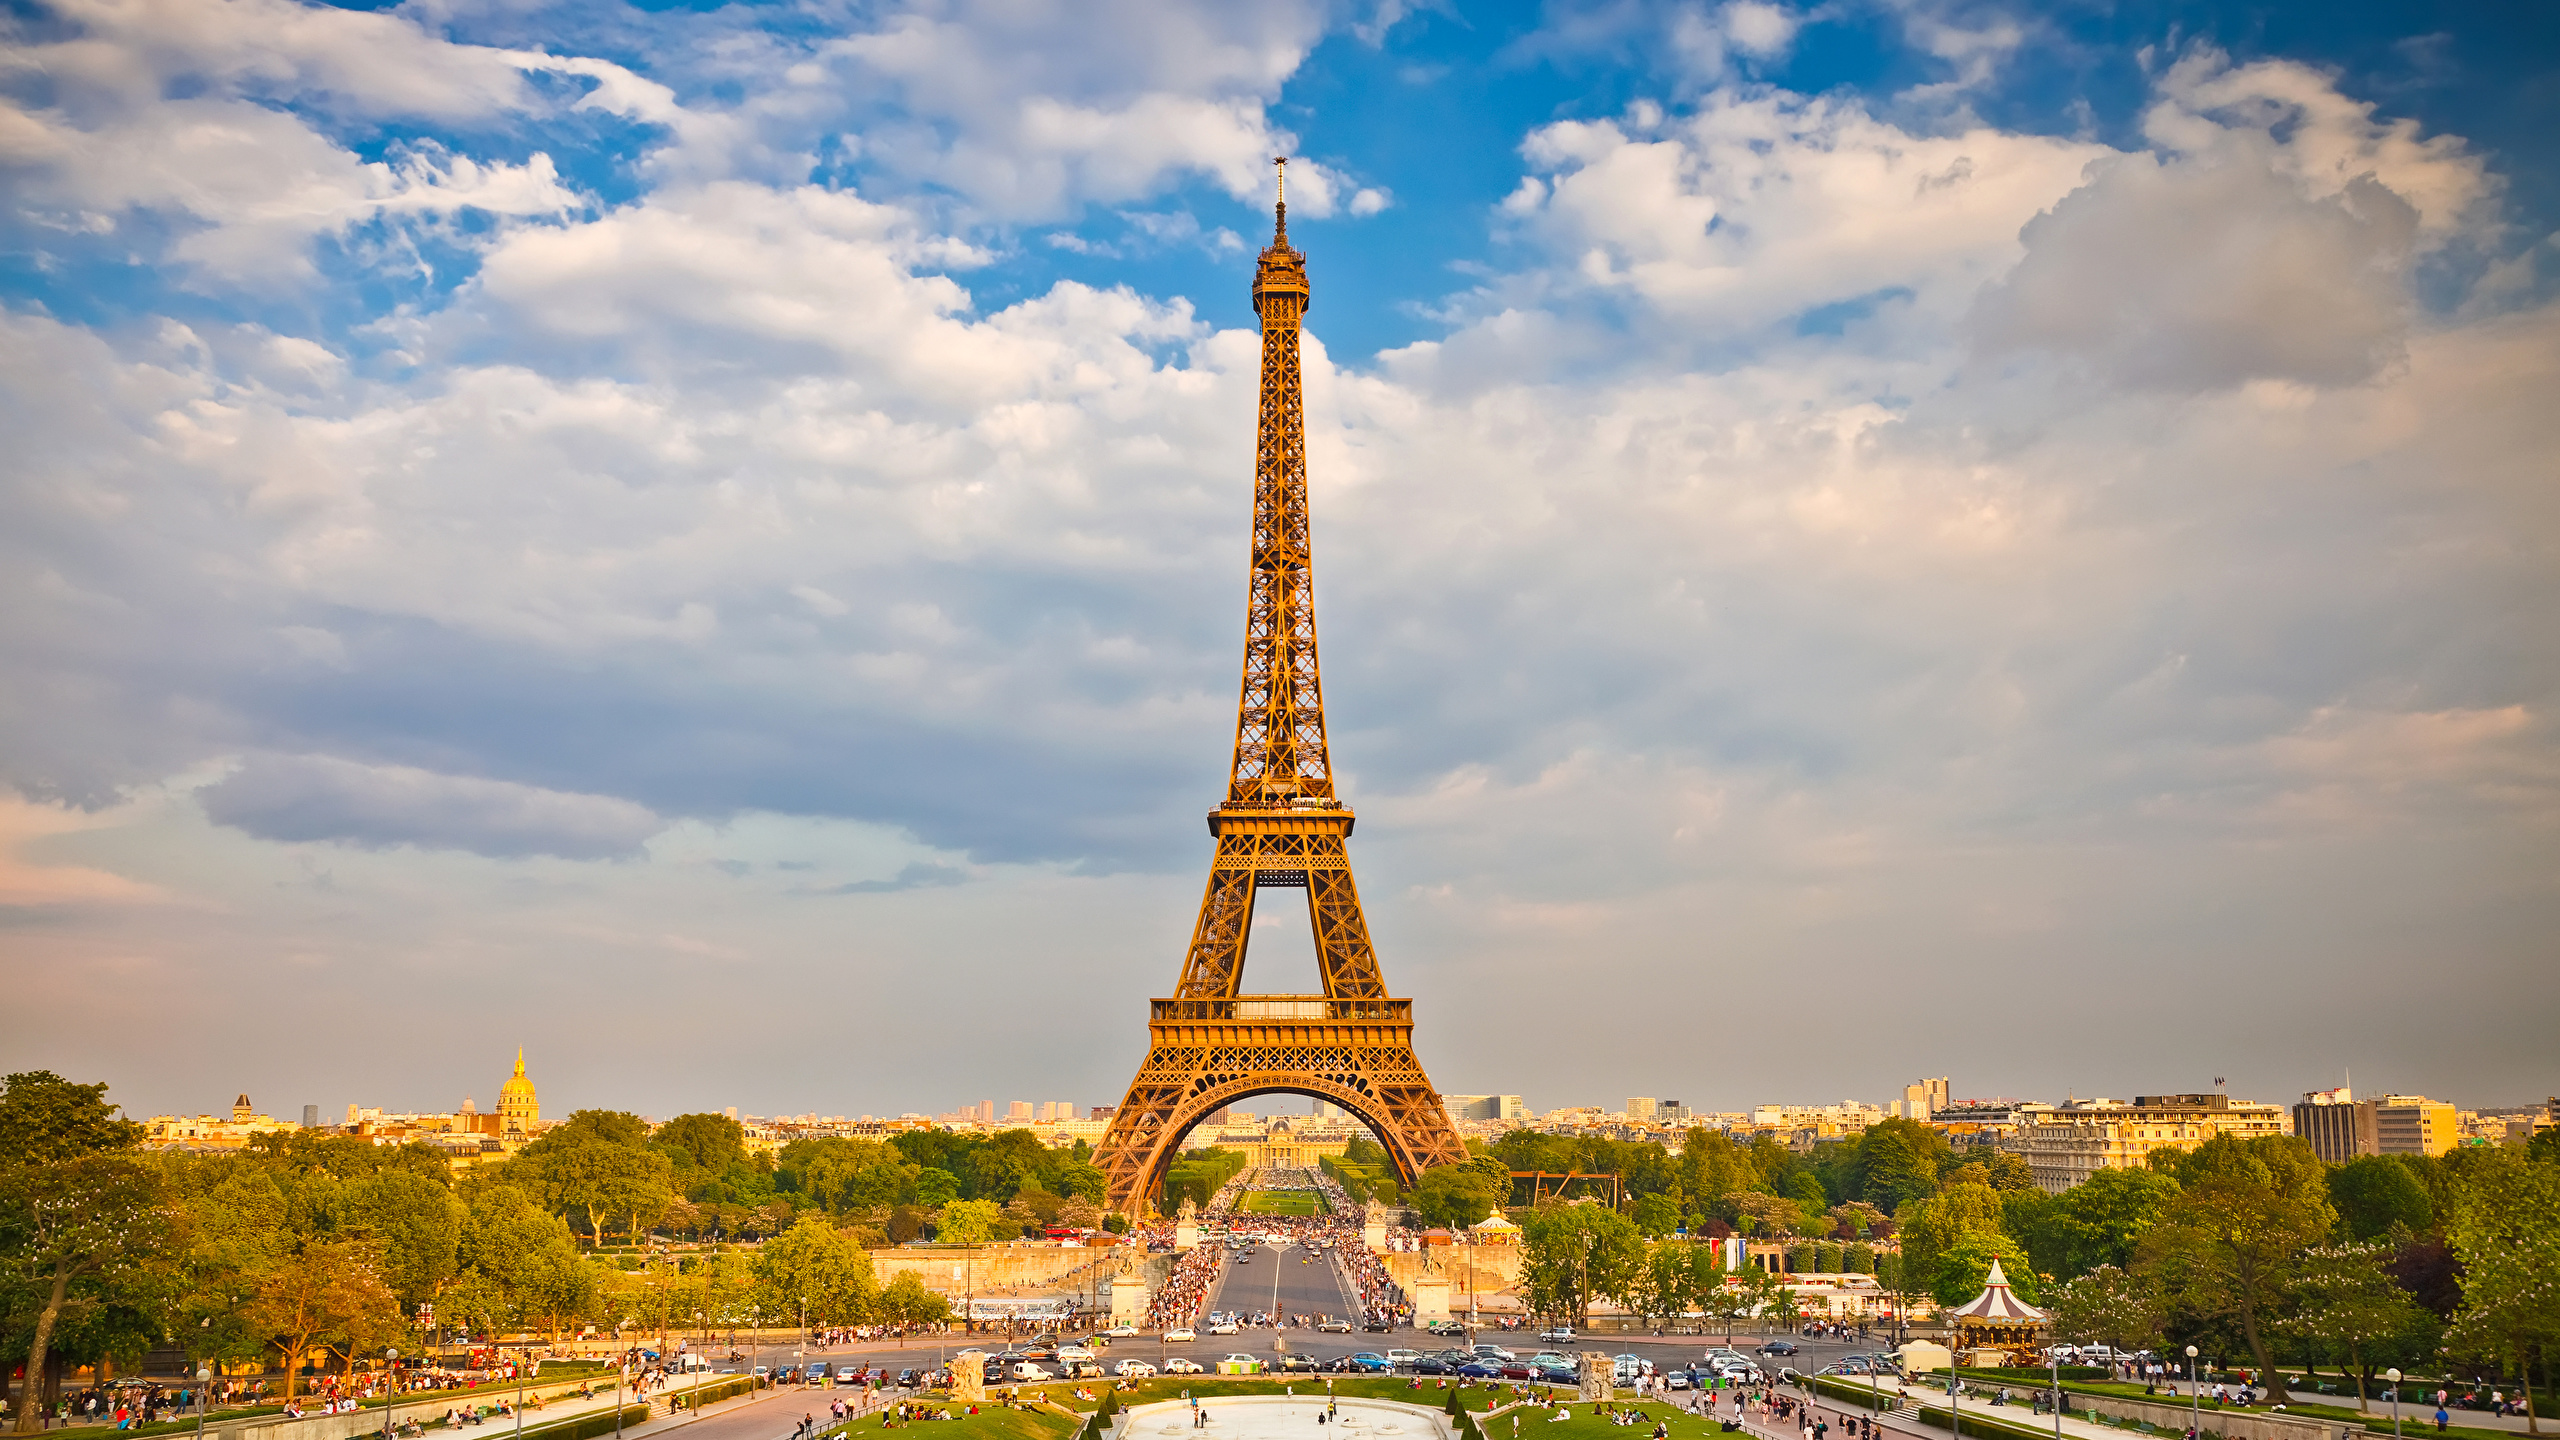 eiffel tower paris france wallpaper home